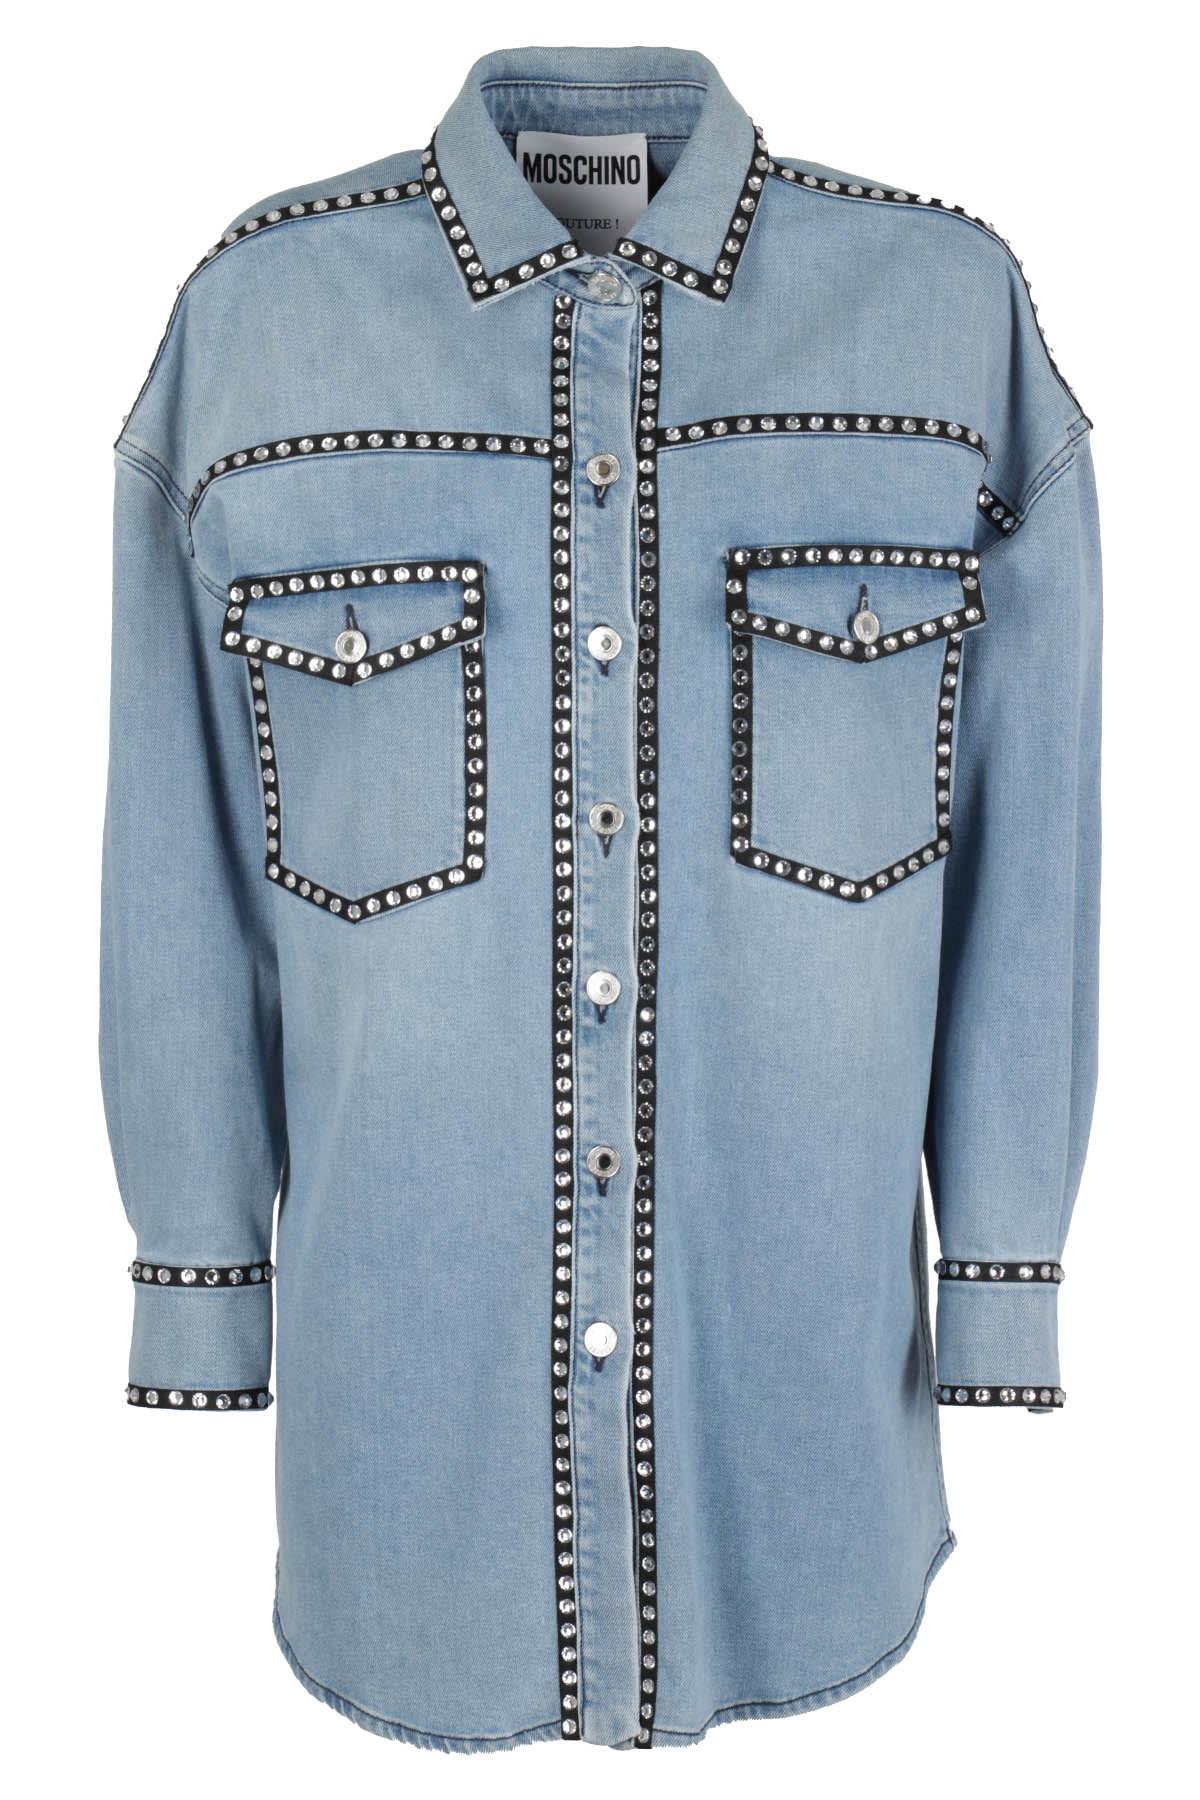 Moschino Jacket In Chiaro